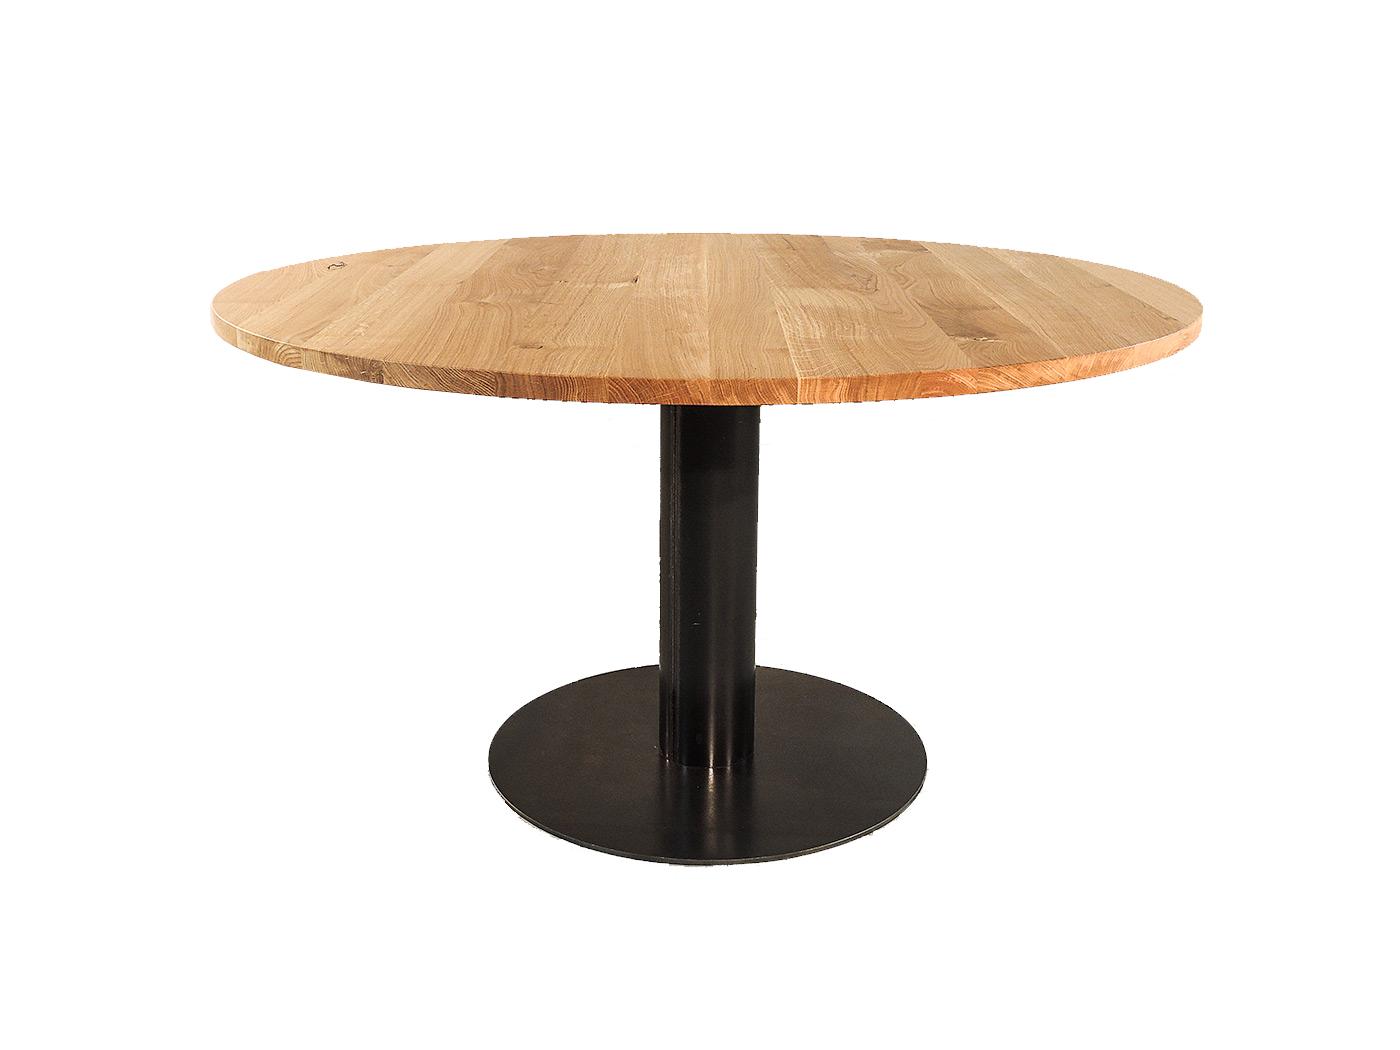 Ronde Tafel Industrieel : Maine elegante ronde eettafel